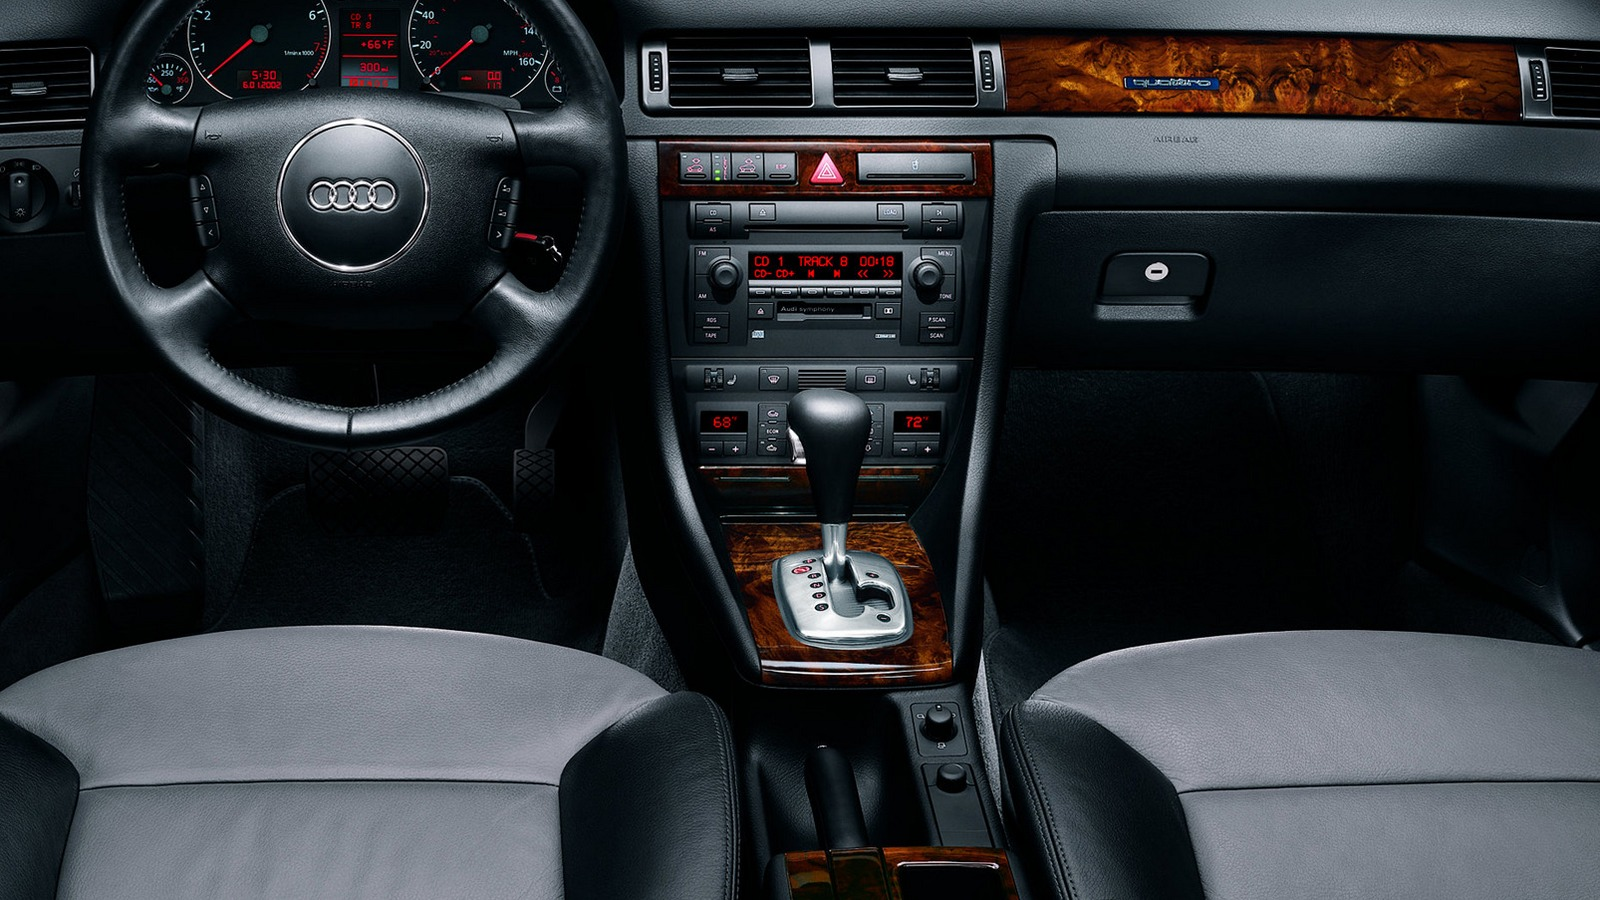 2000 Audi A6 27t Quattro Problems